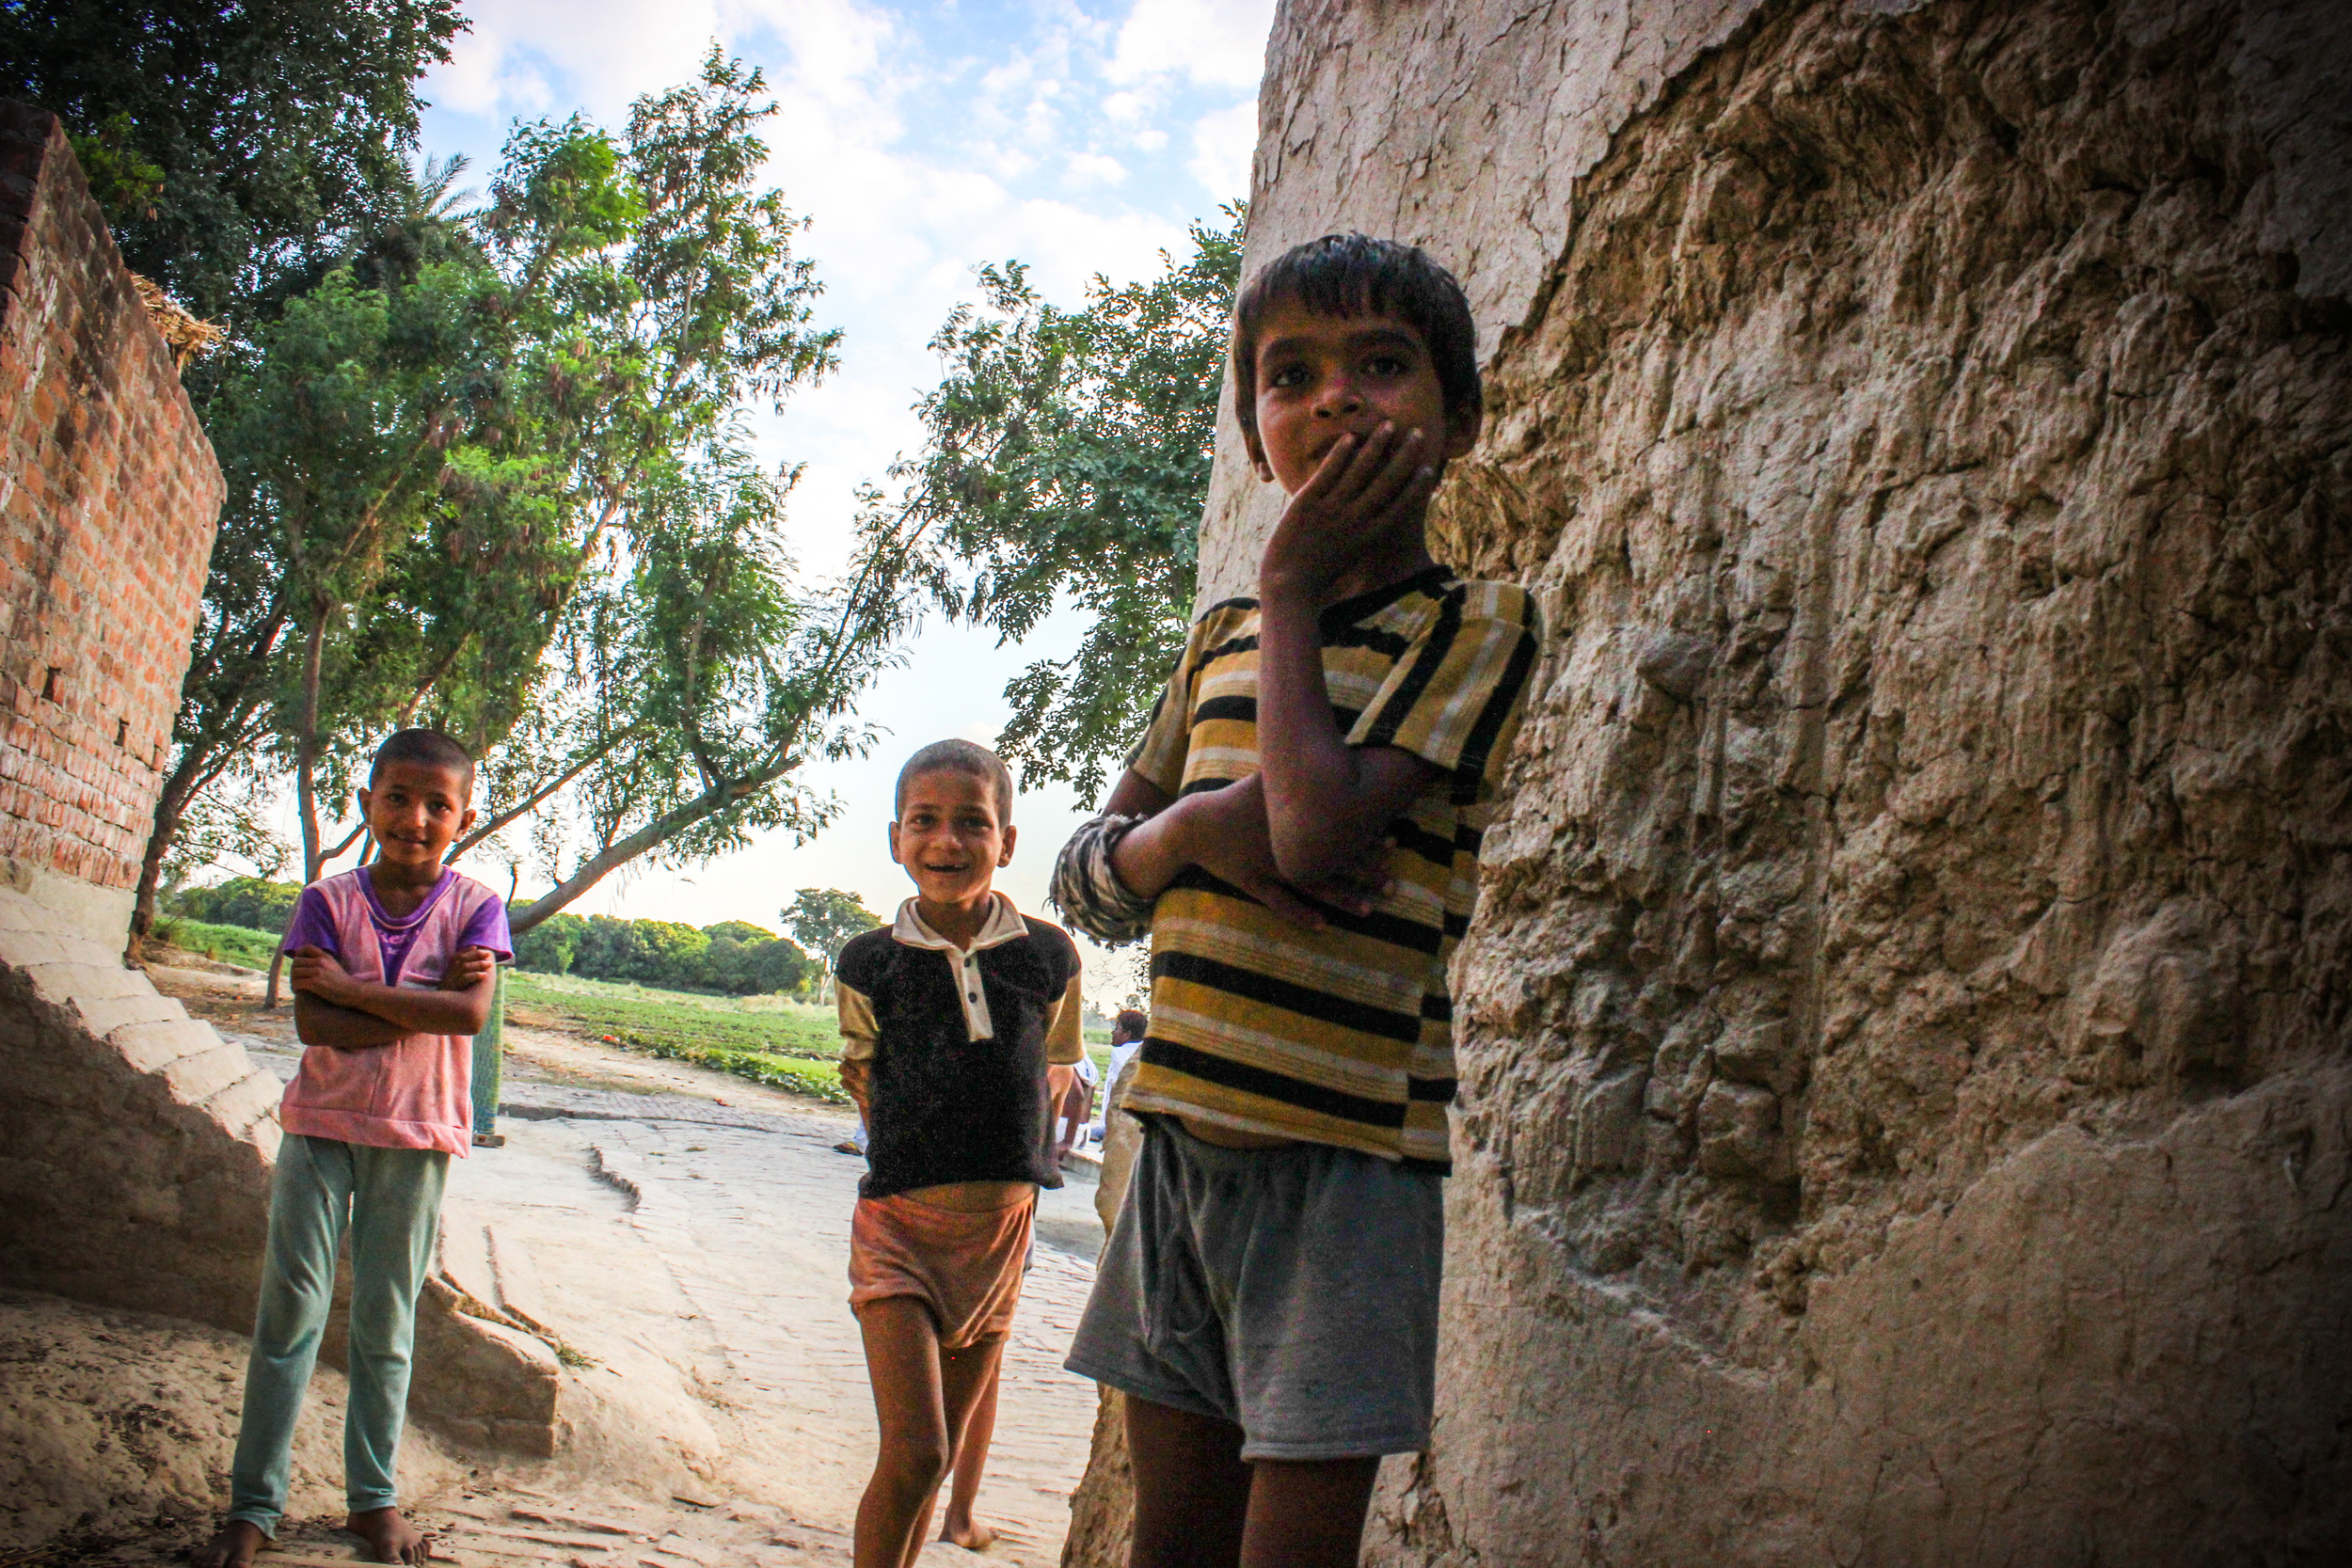 Children fromthe village we visited.